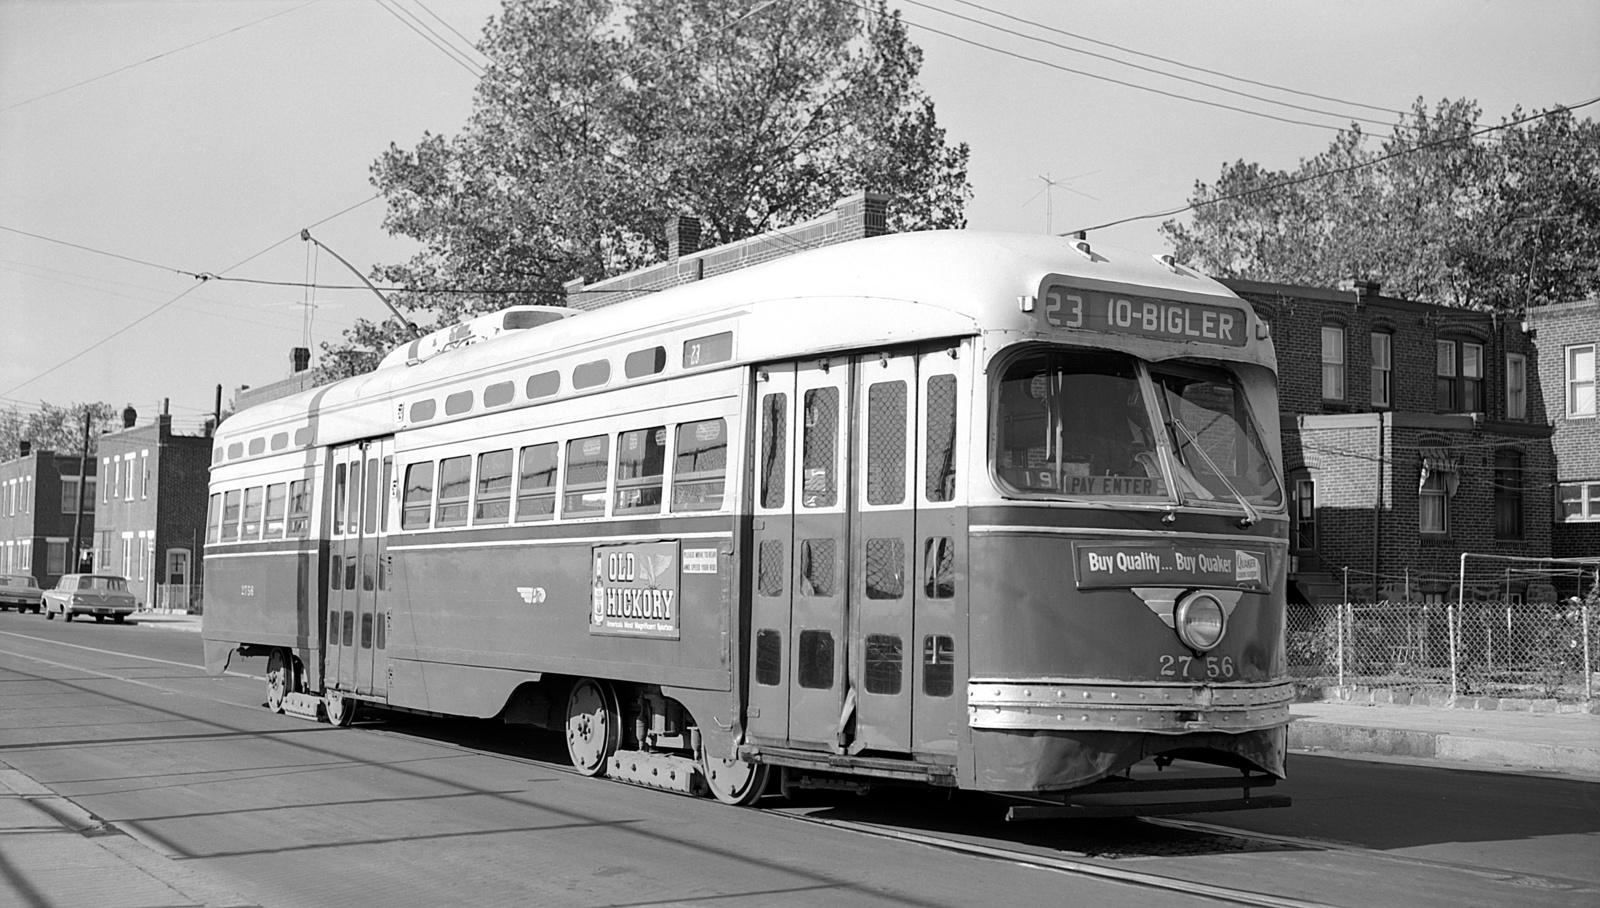 (529k, 1600x908)<br><b>Country:</b> United States<br><b>City:</b> Philadelphia, PA<br><b>System:</b> SEPTA (or Predecessor)<br><b>Line:</b> Rt. 23-Germantown<br><b>Location:</b> 10th/Bigler<br><b>Car:</b> PTC/SEPTA Postwar All-electric PCC (St.Louis, 1947) 2756 <br><b>Collection of:</b> David Pirmann<br><b>Date:</b> 10/1961<br><b>Viewed (this week/total):</b> 0 / 53